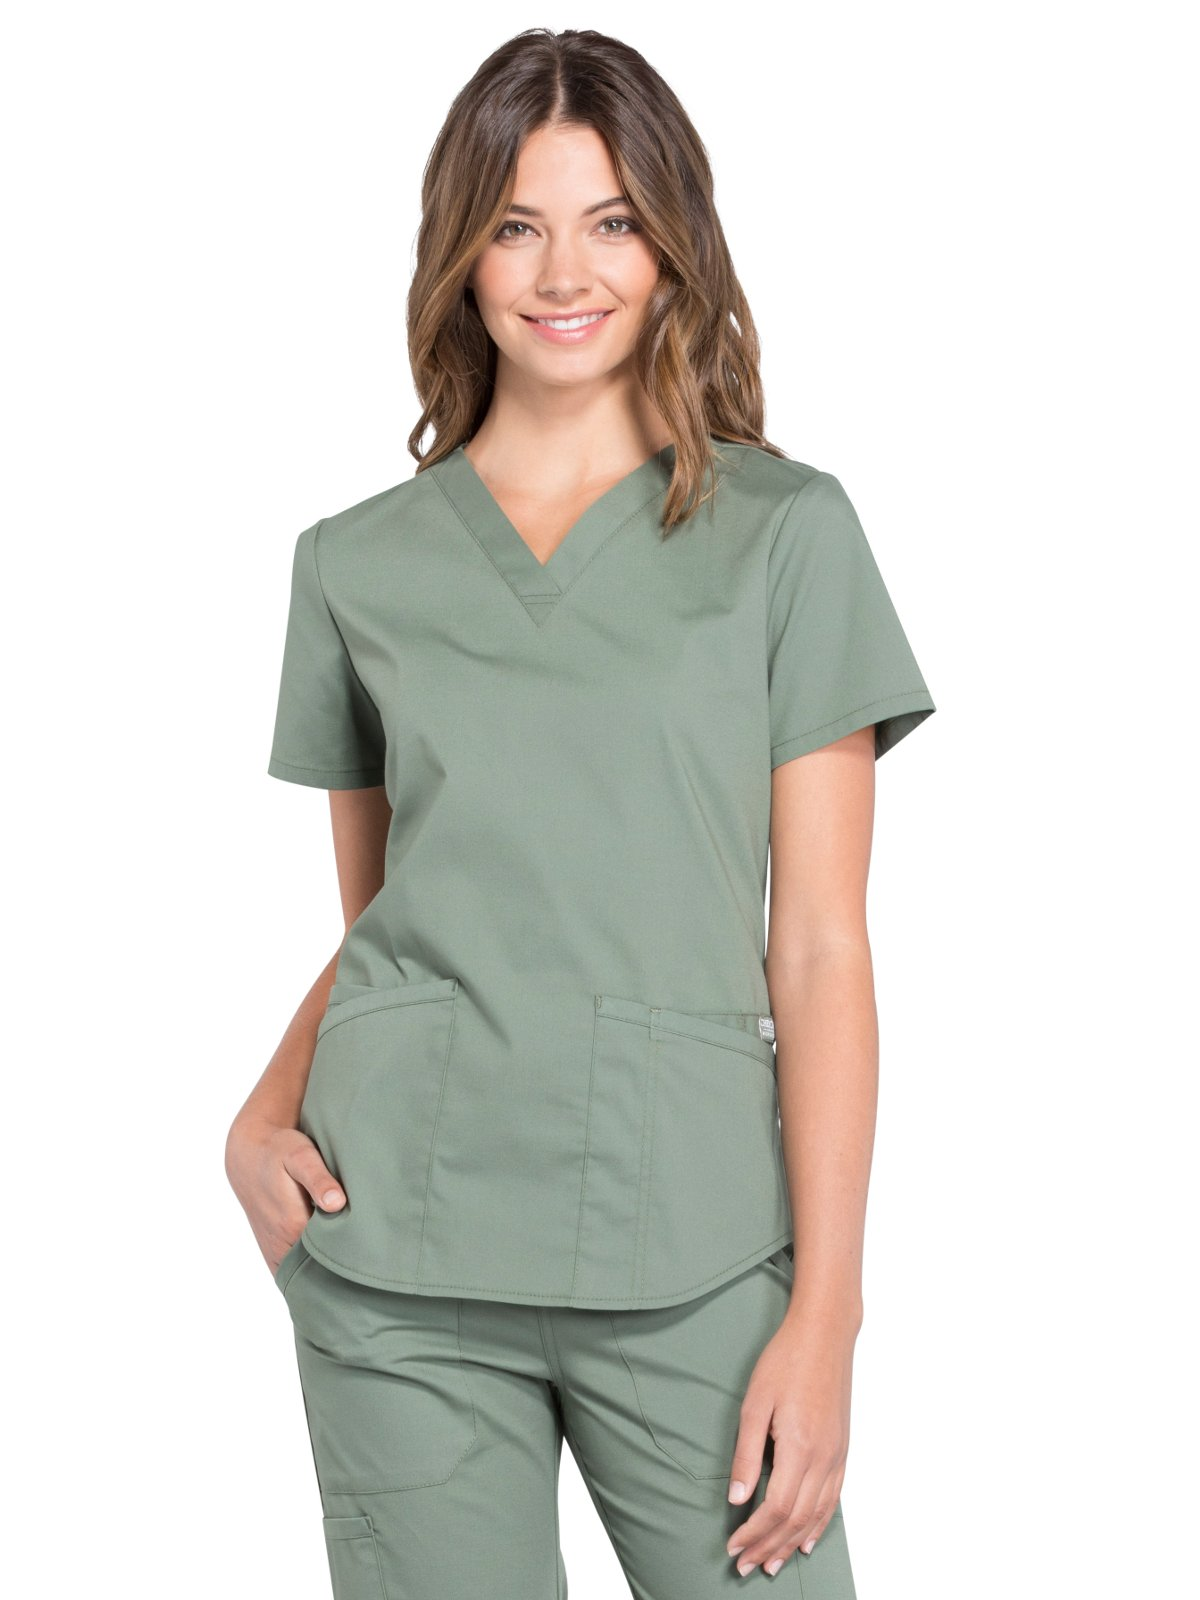 Cherokee Professionals Workwear Women's V-Neck Solid Scrub Top Medium Olive